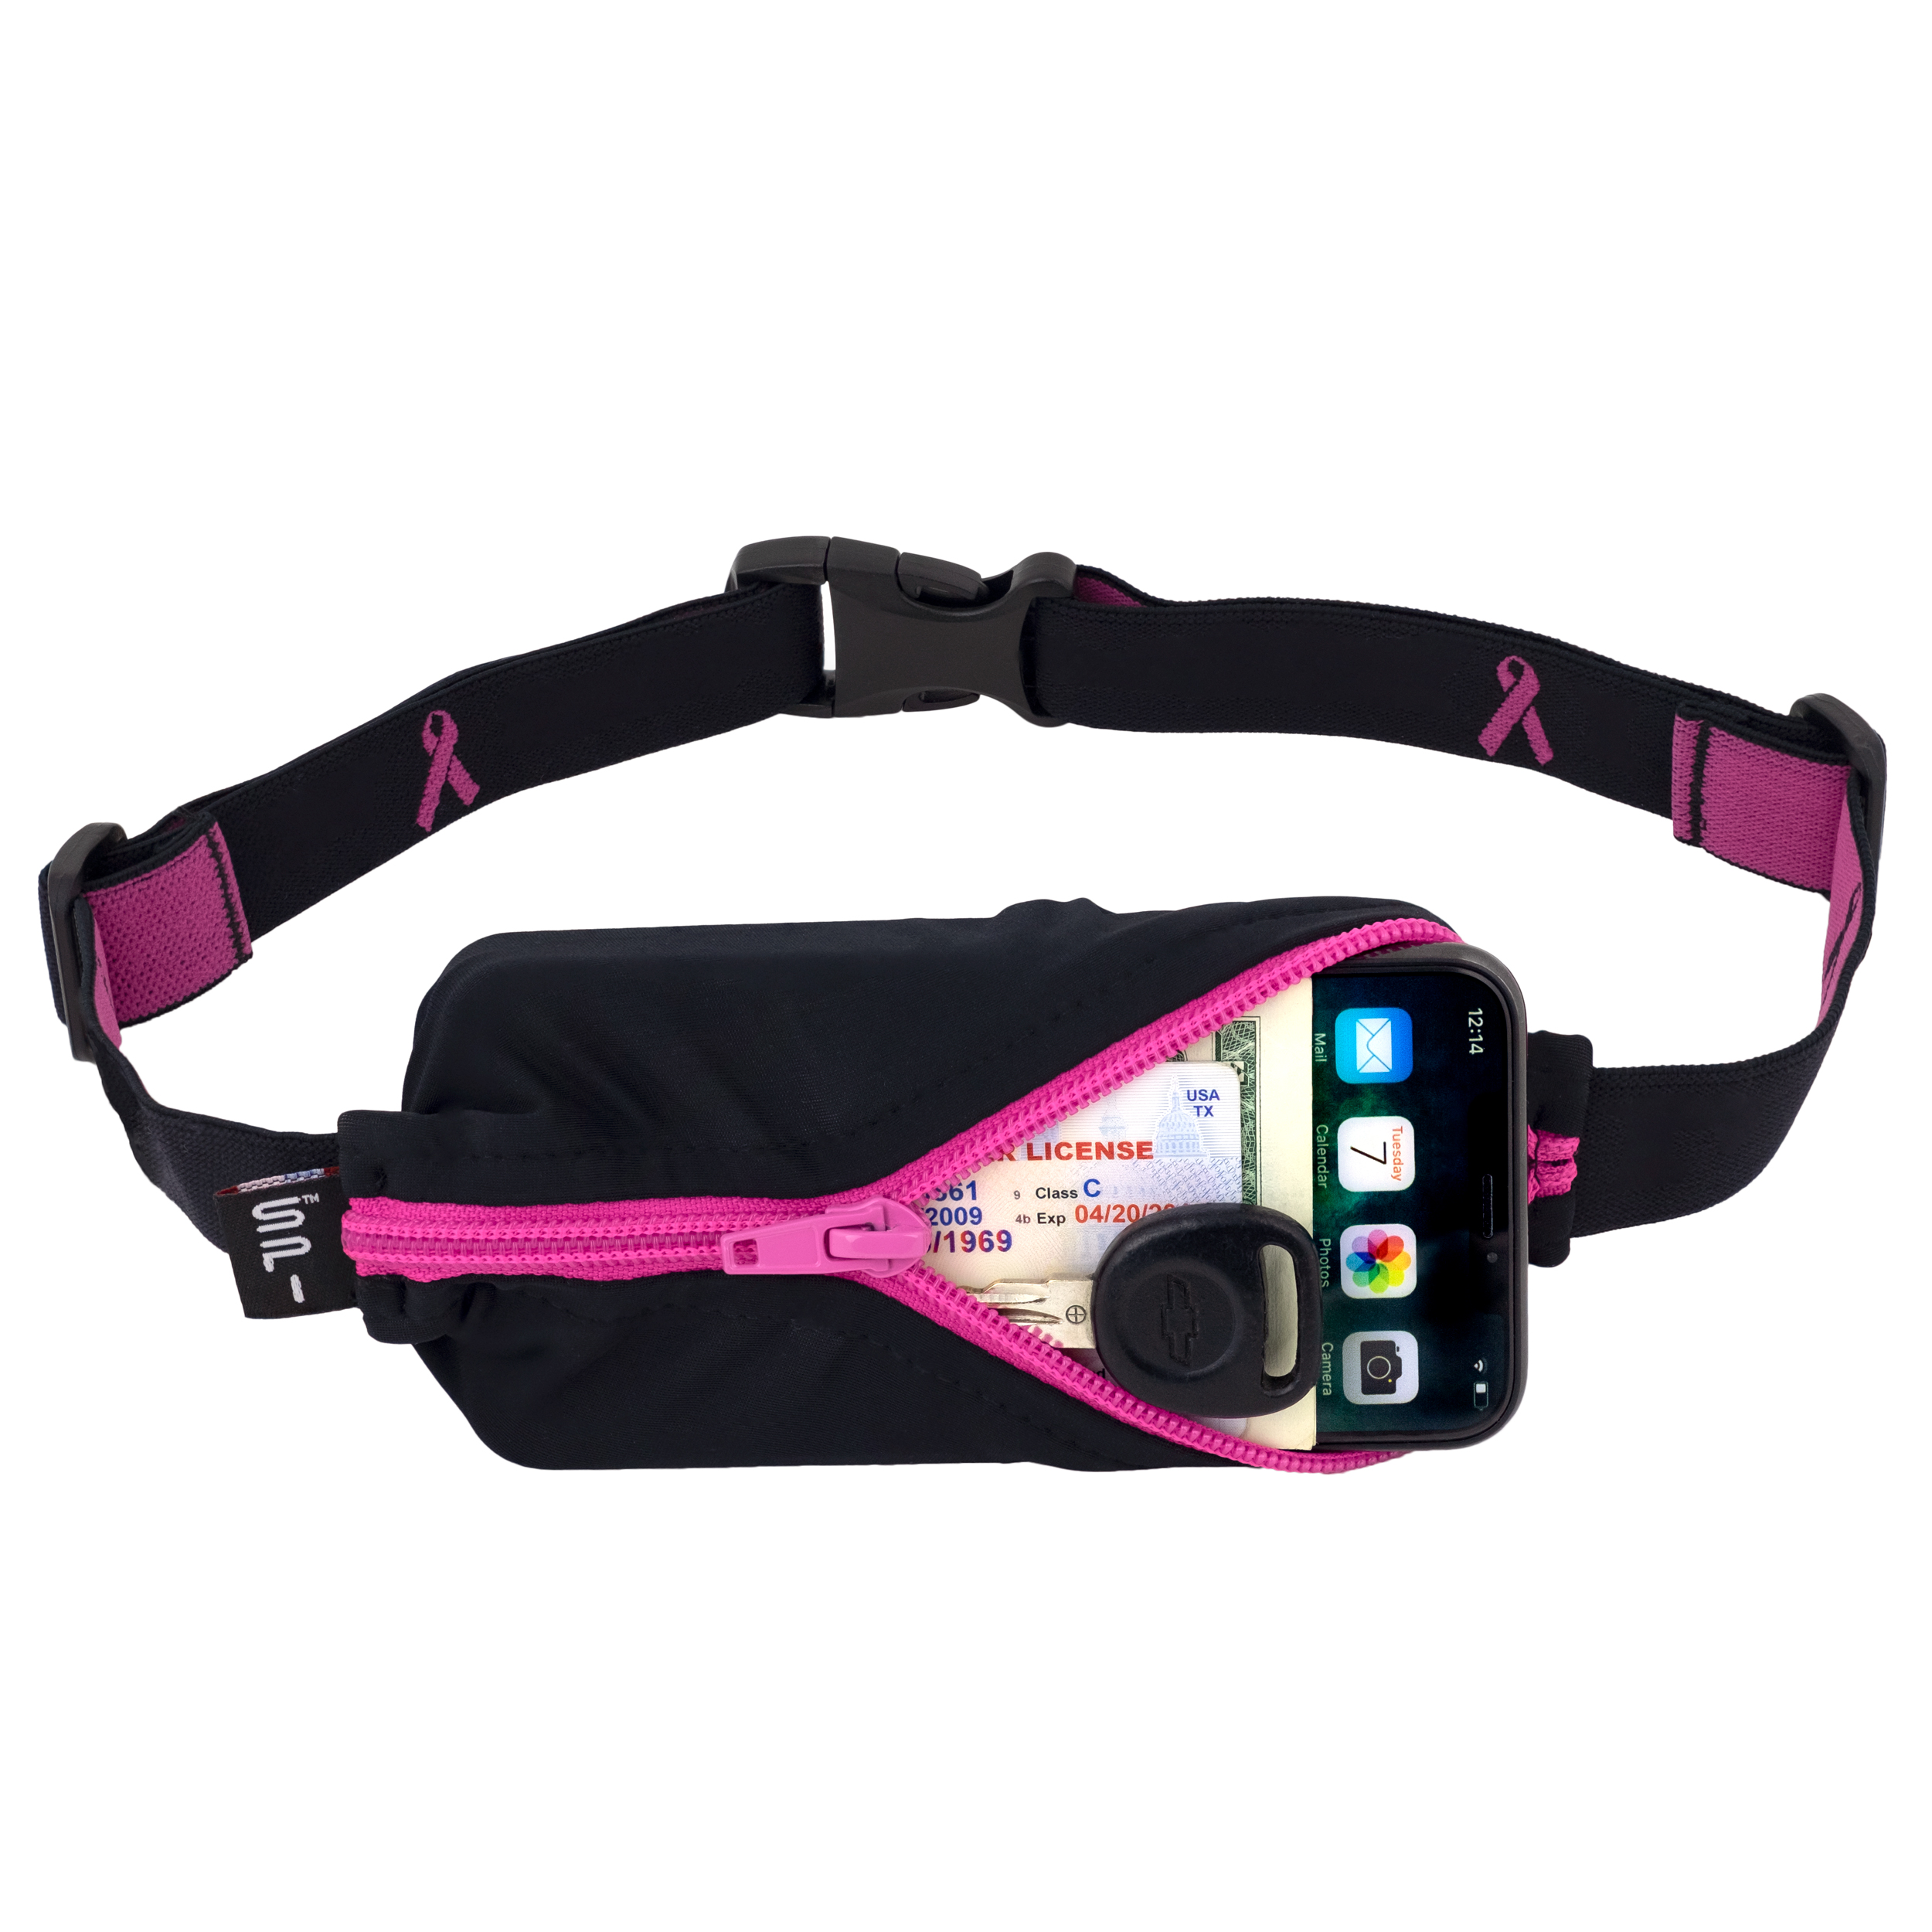 SPIbelt Original Pink Ribbon - Limited Edition